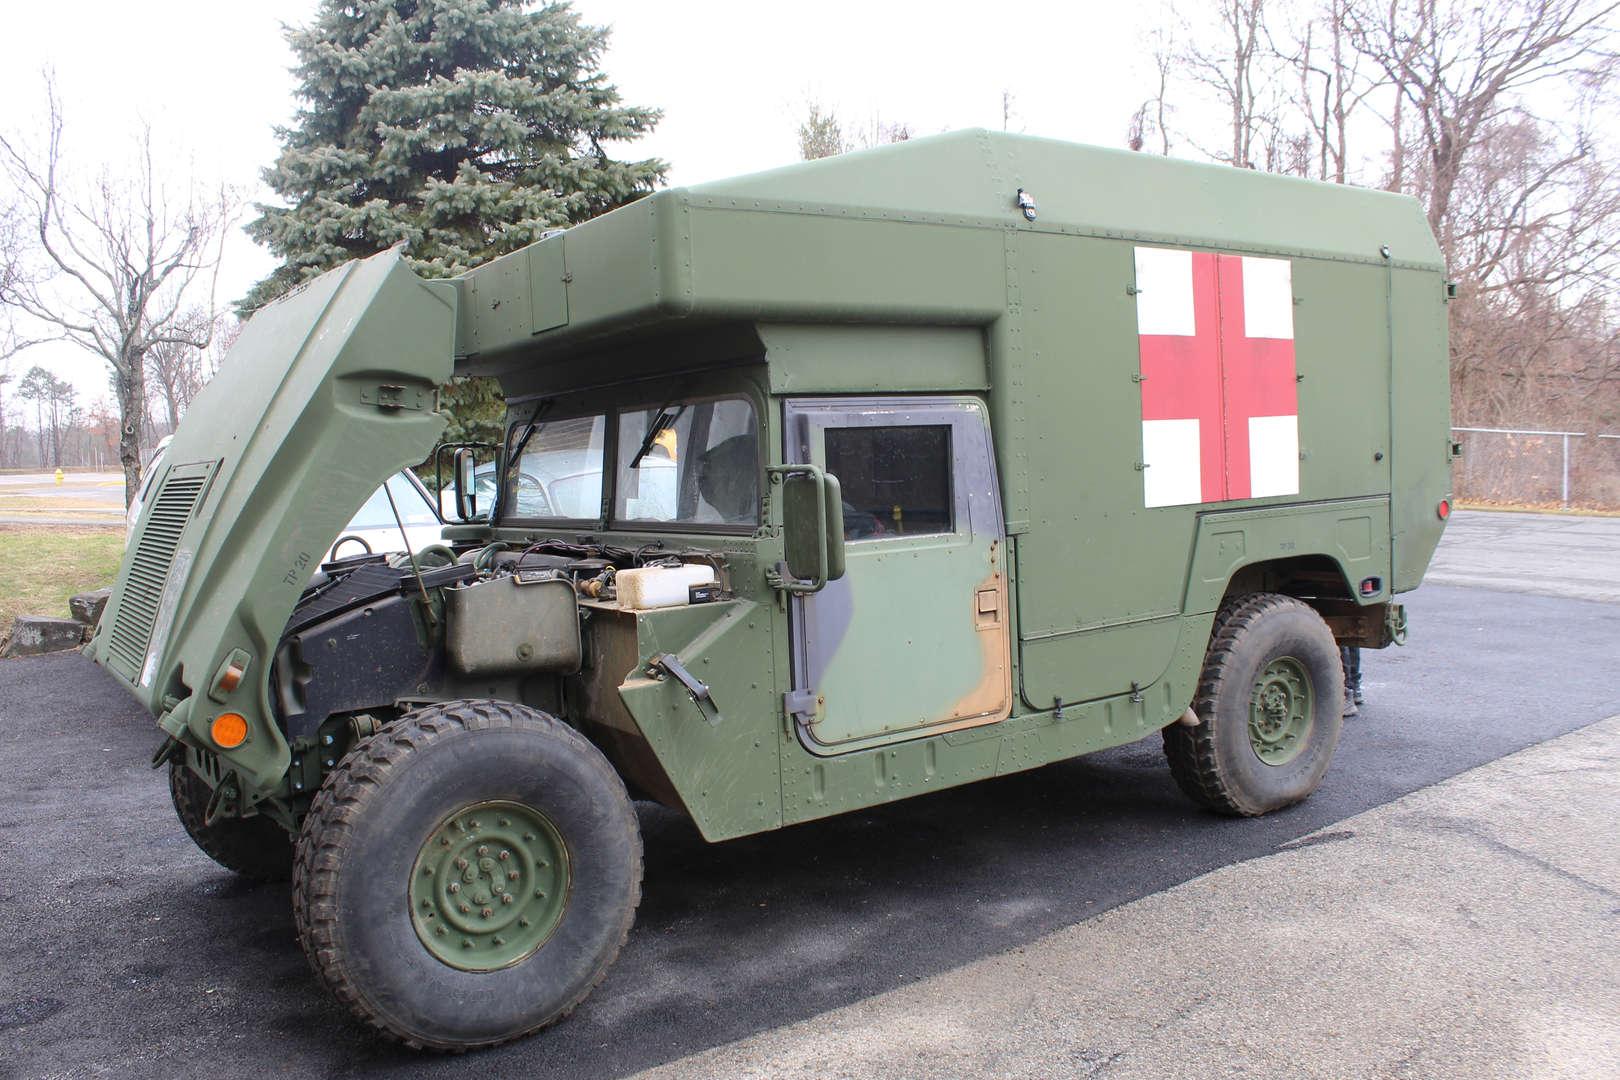 Humvee ambulance with hood up